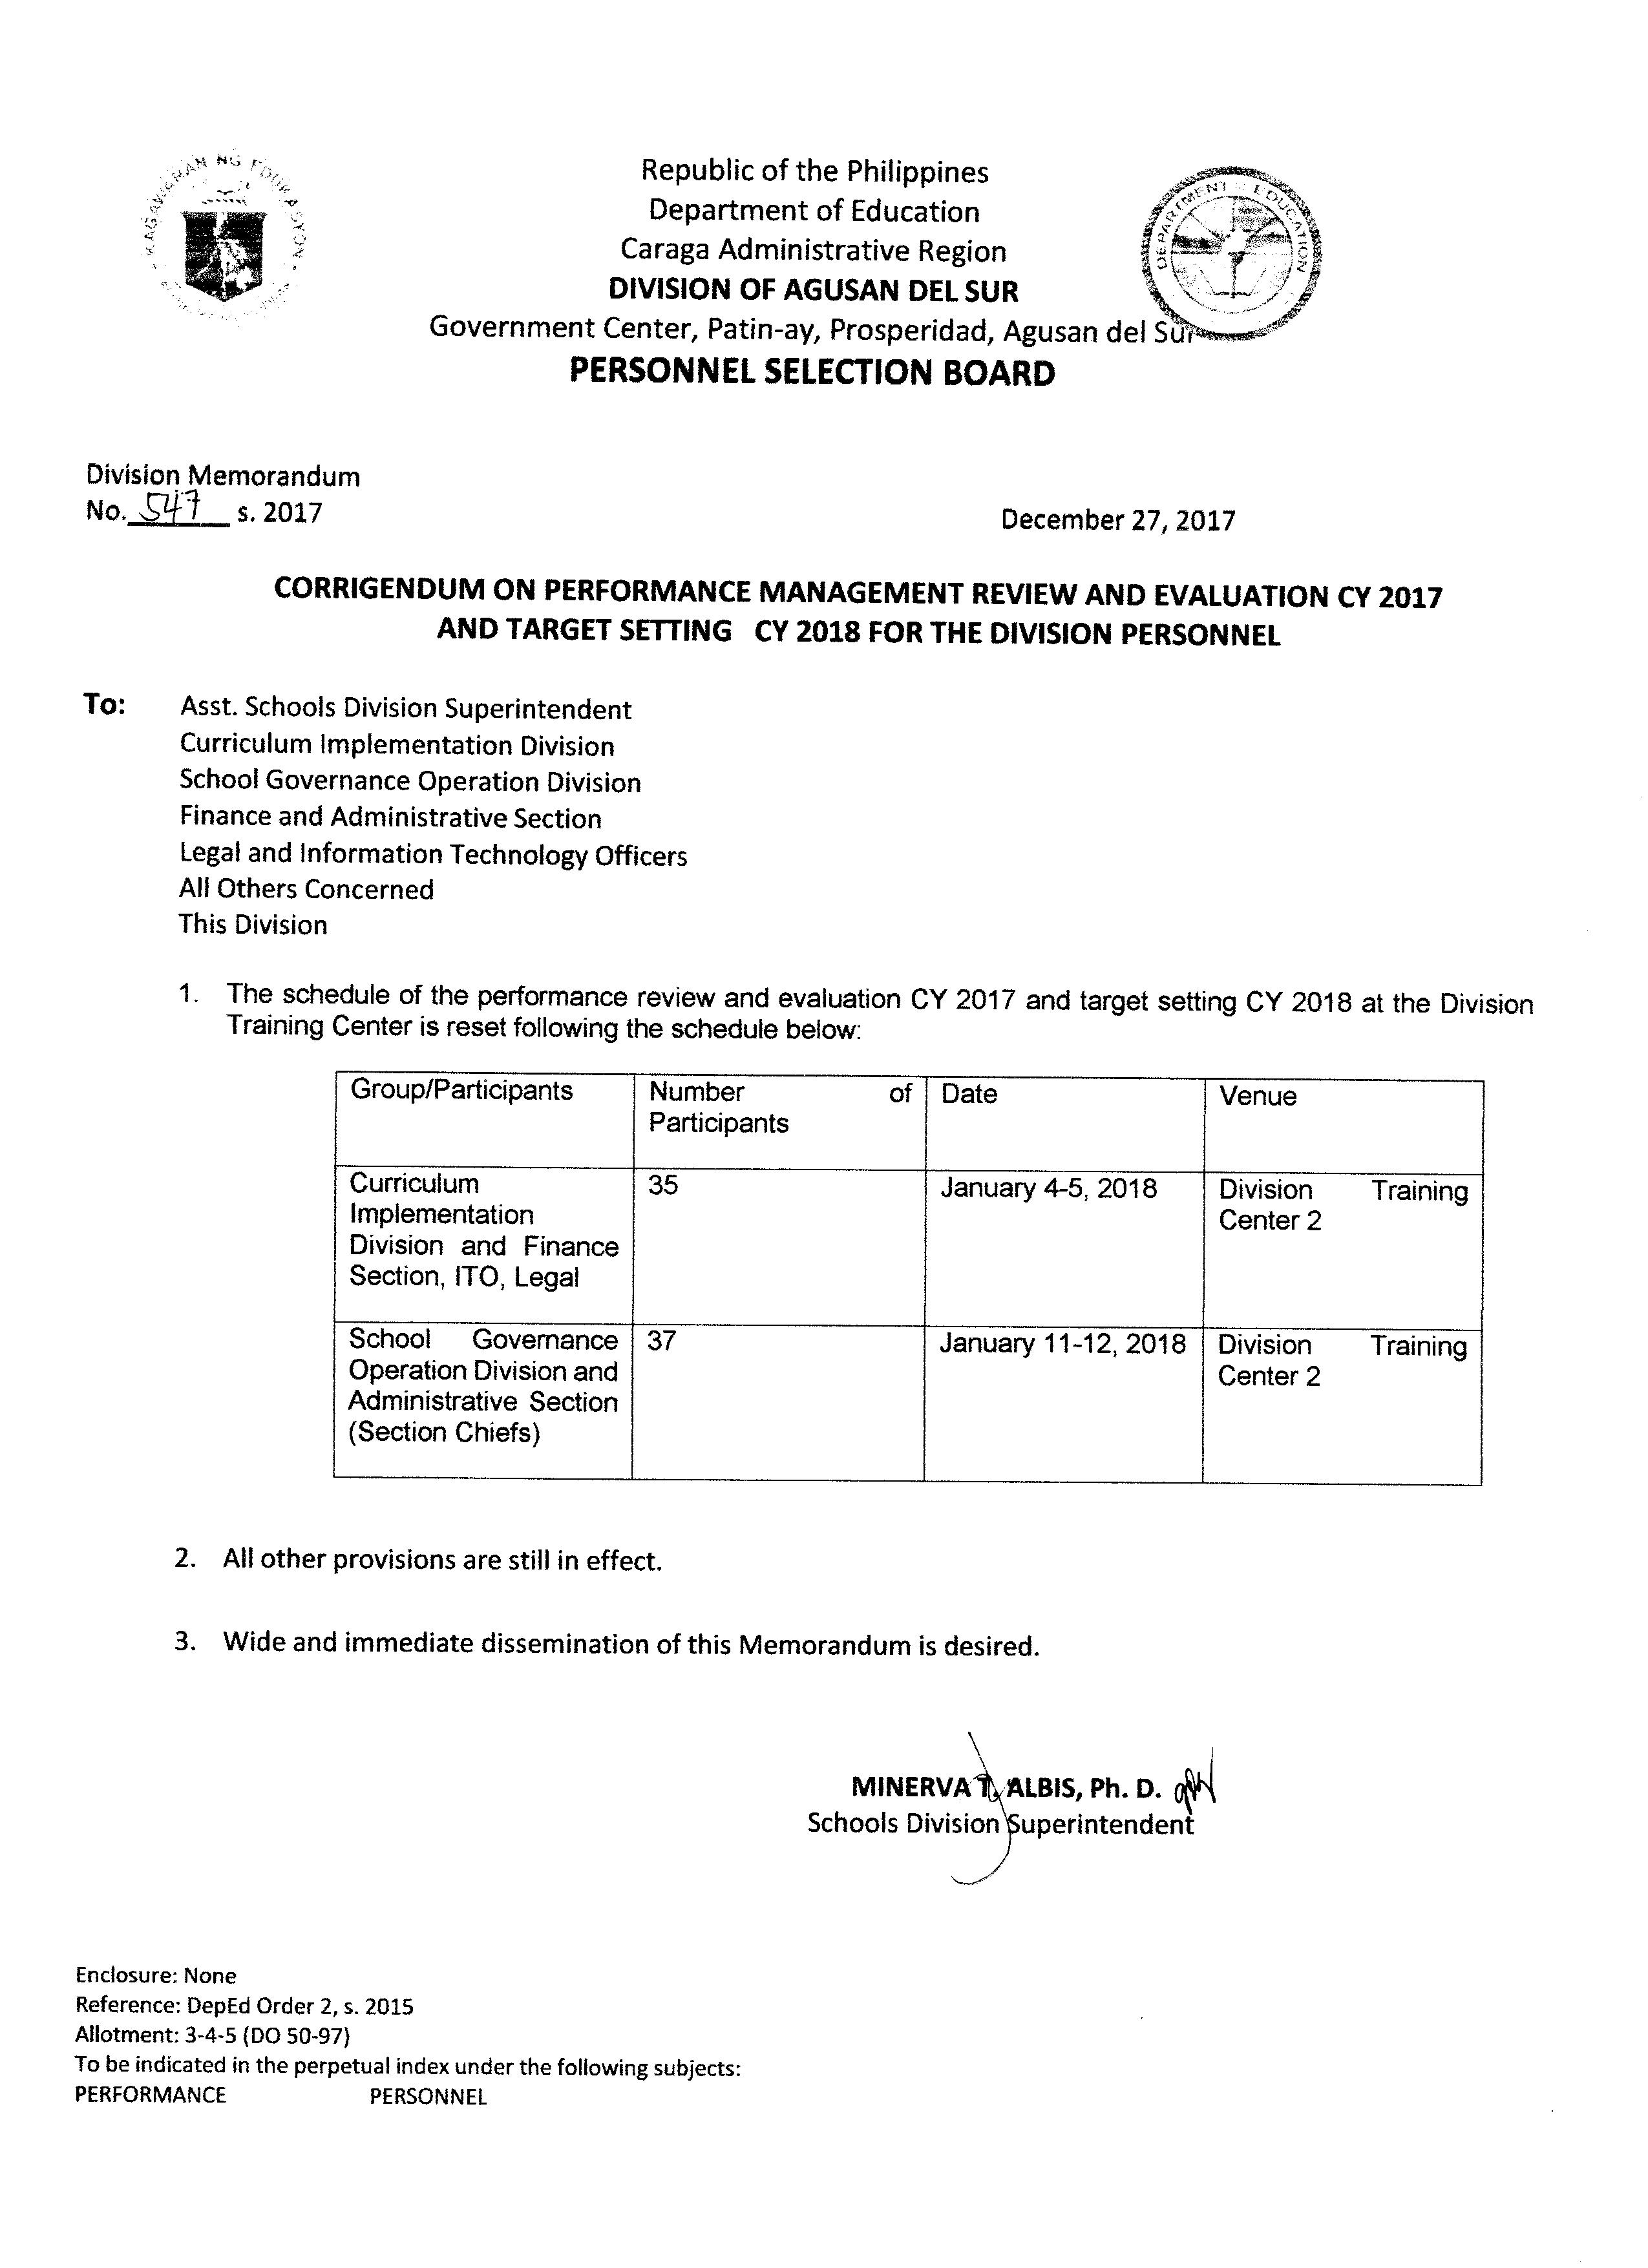 Department of Education : Agusan del Sur Division - Home